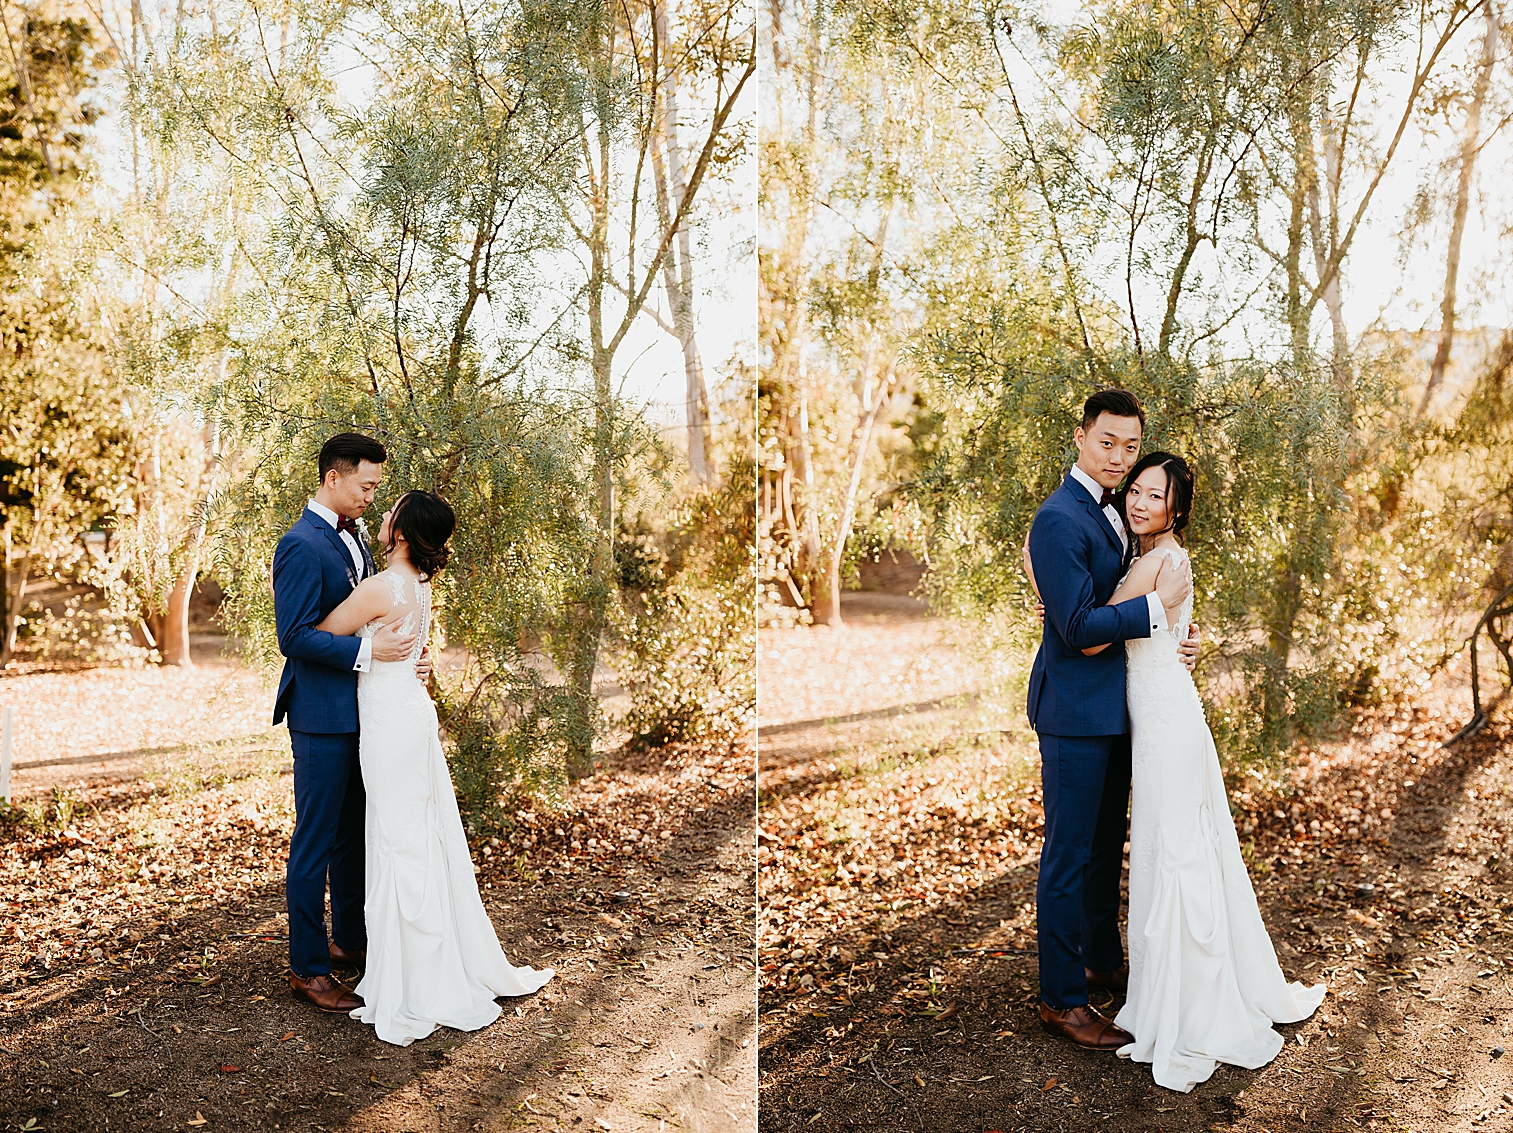 Secret-Garden-Rancho-Santa-Fe-Wedding-97.jpg